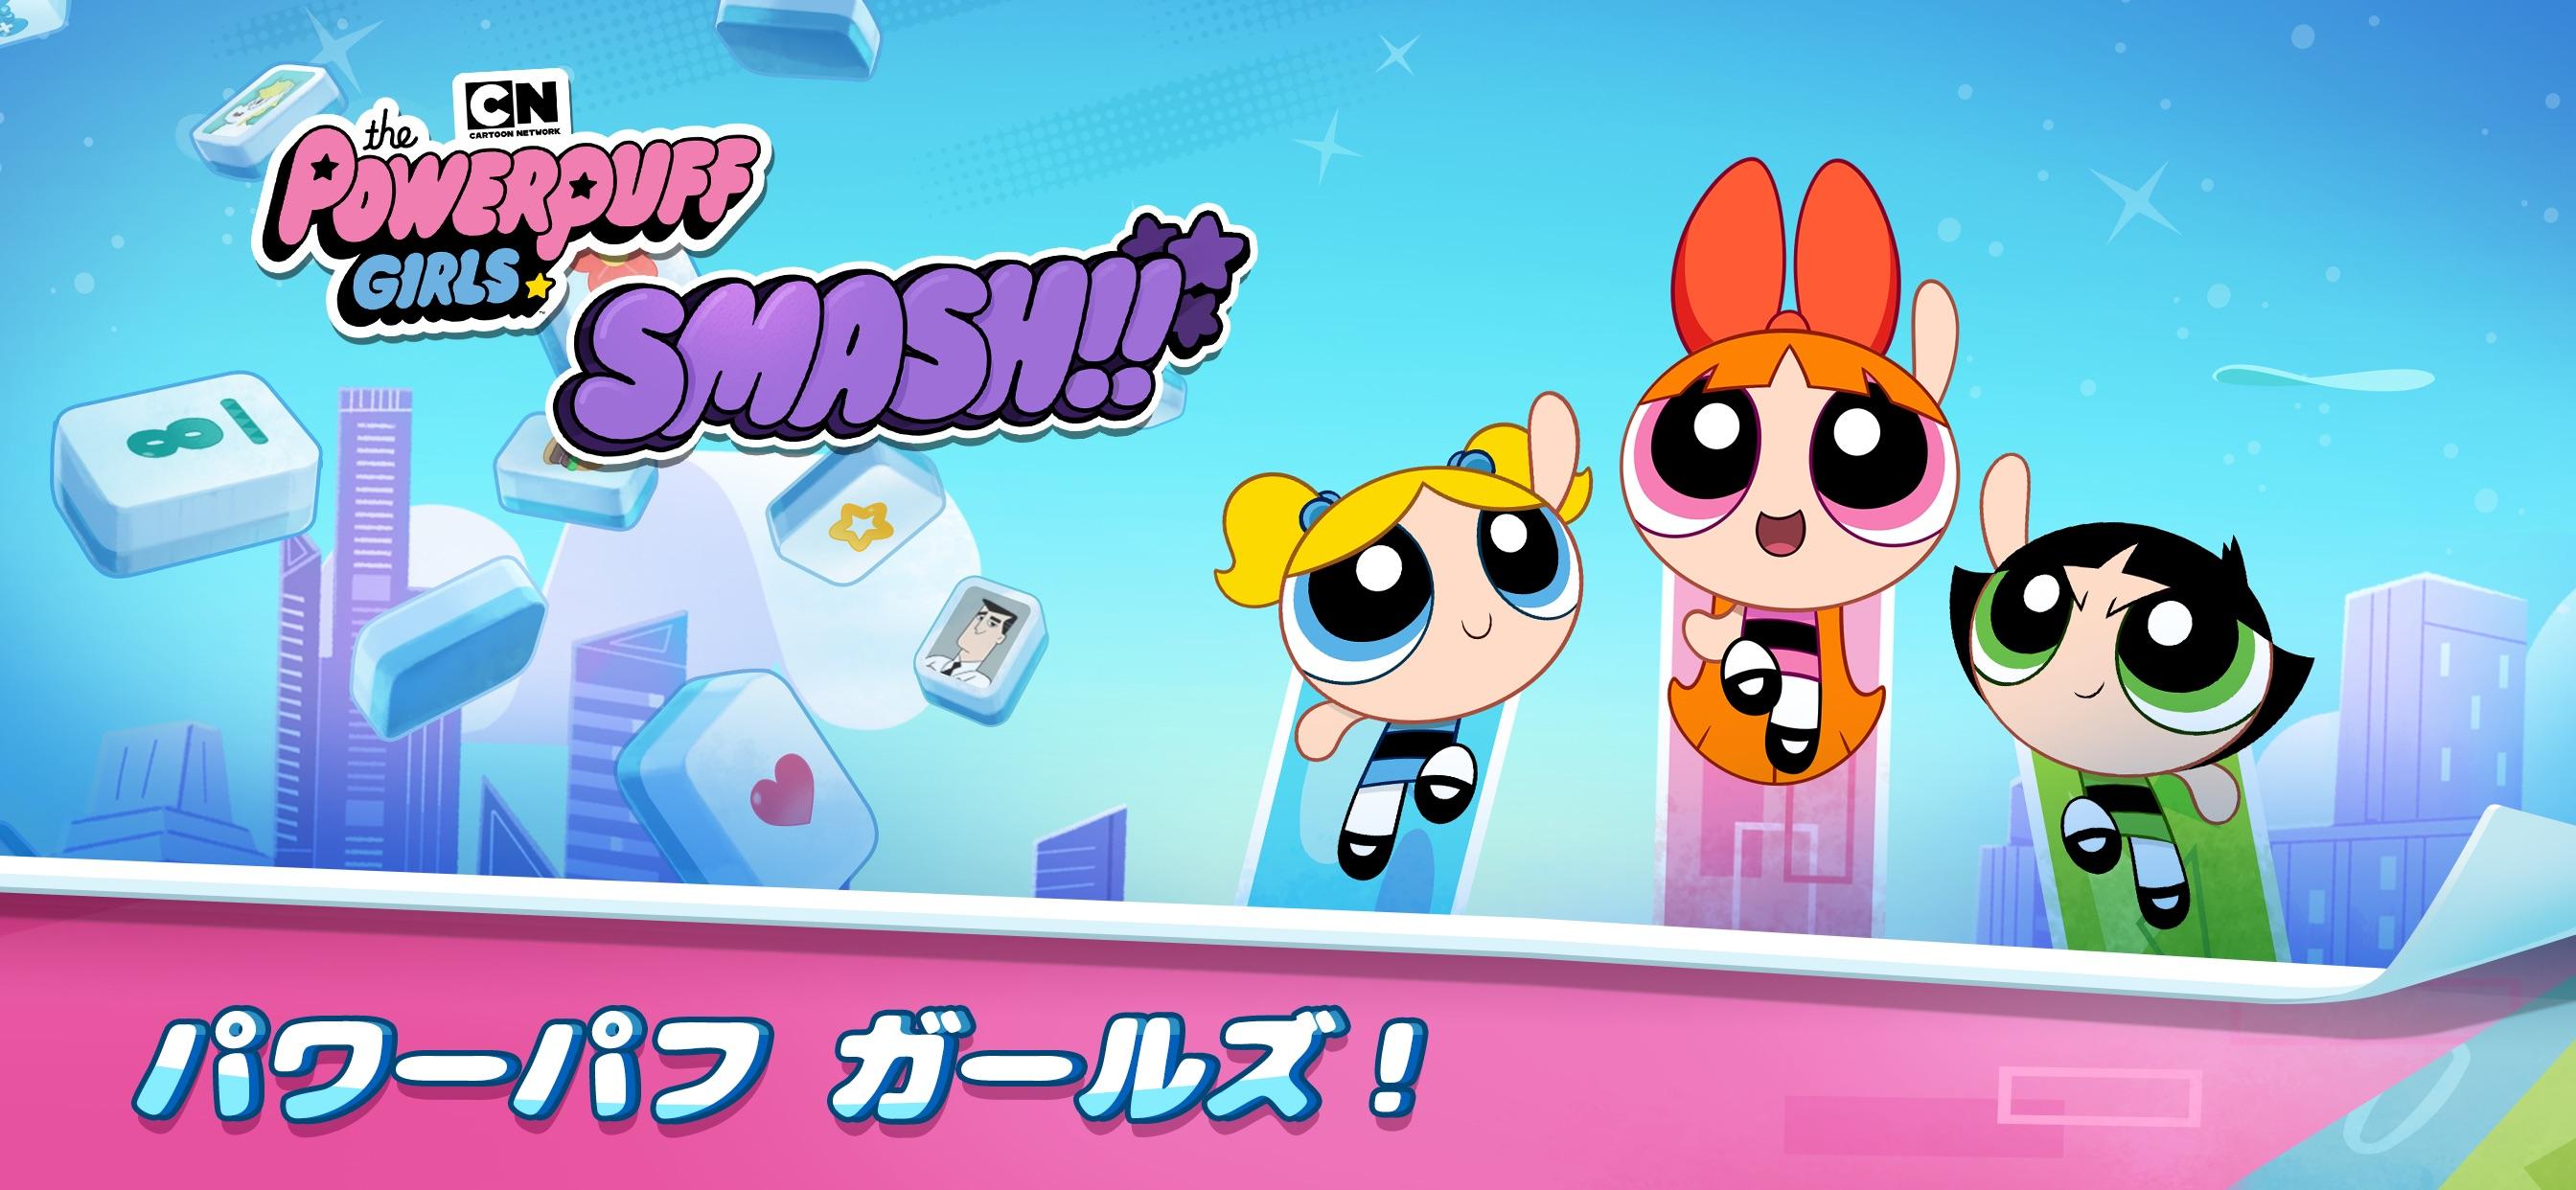 The Powerpuff Girls Smash App Store Review Aso Revenue Downloads Appfollow